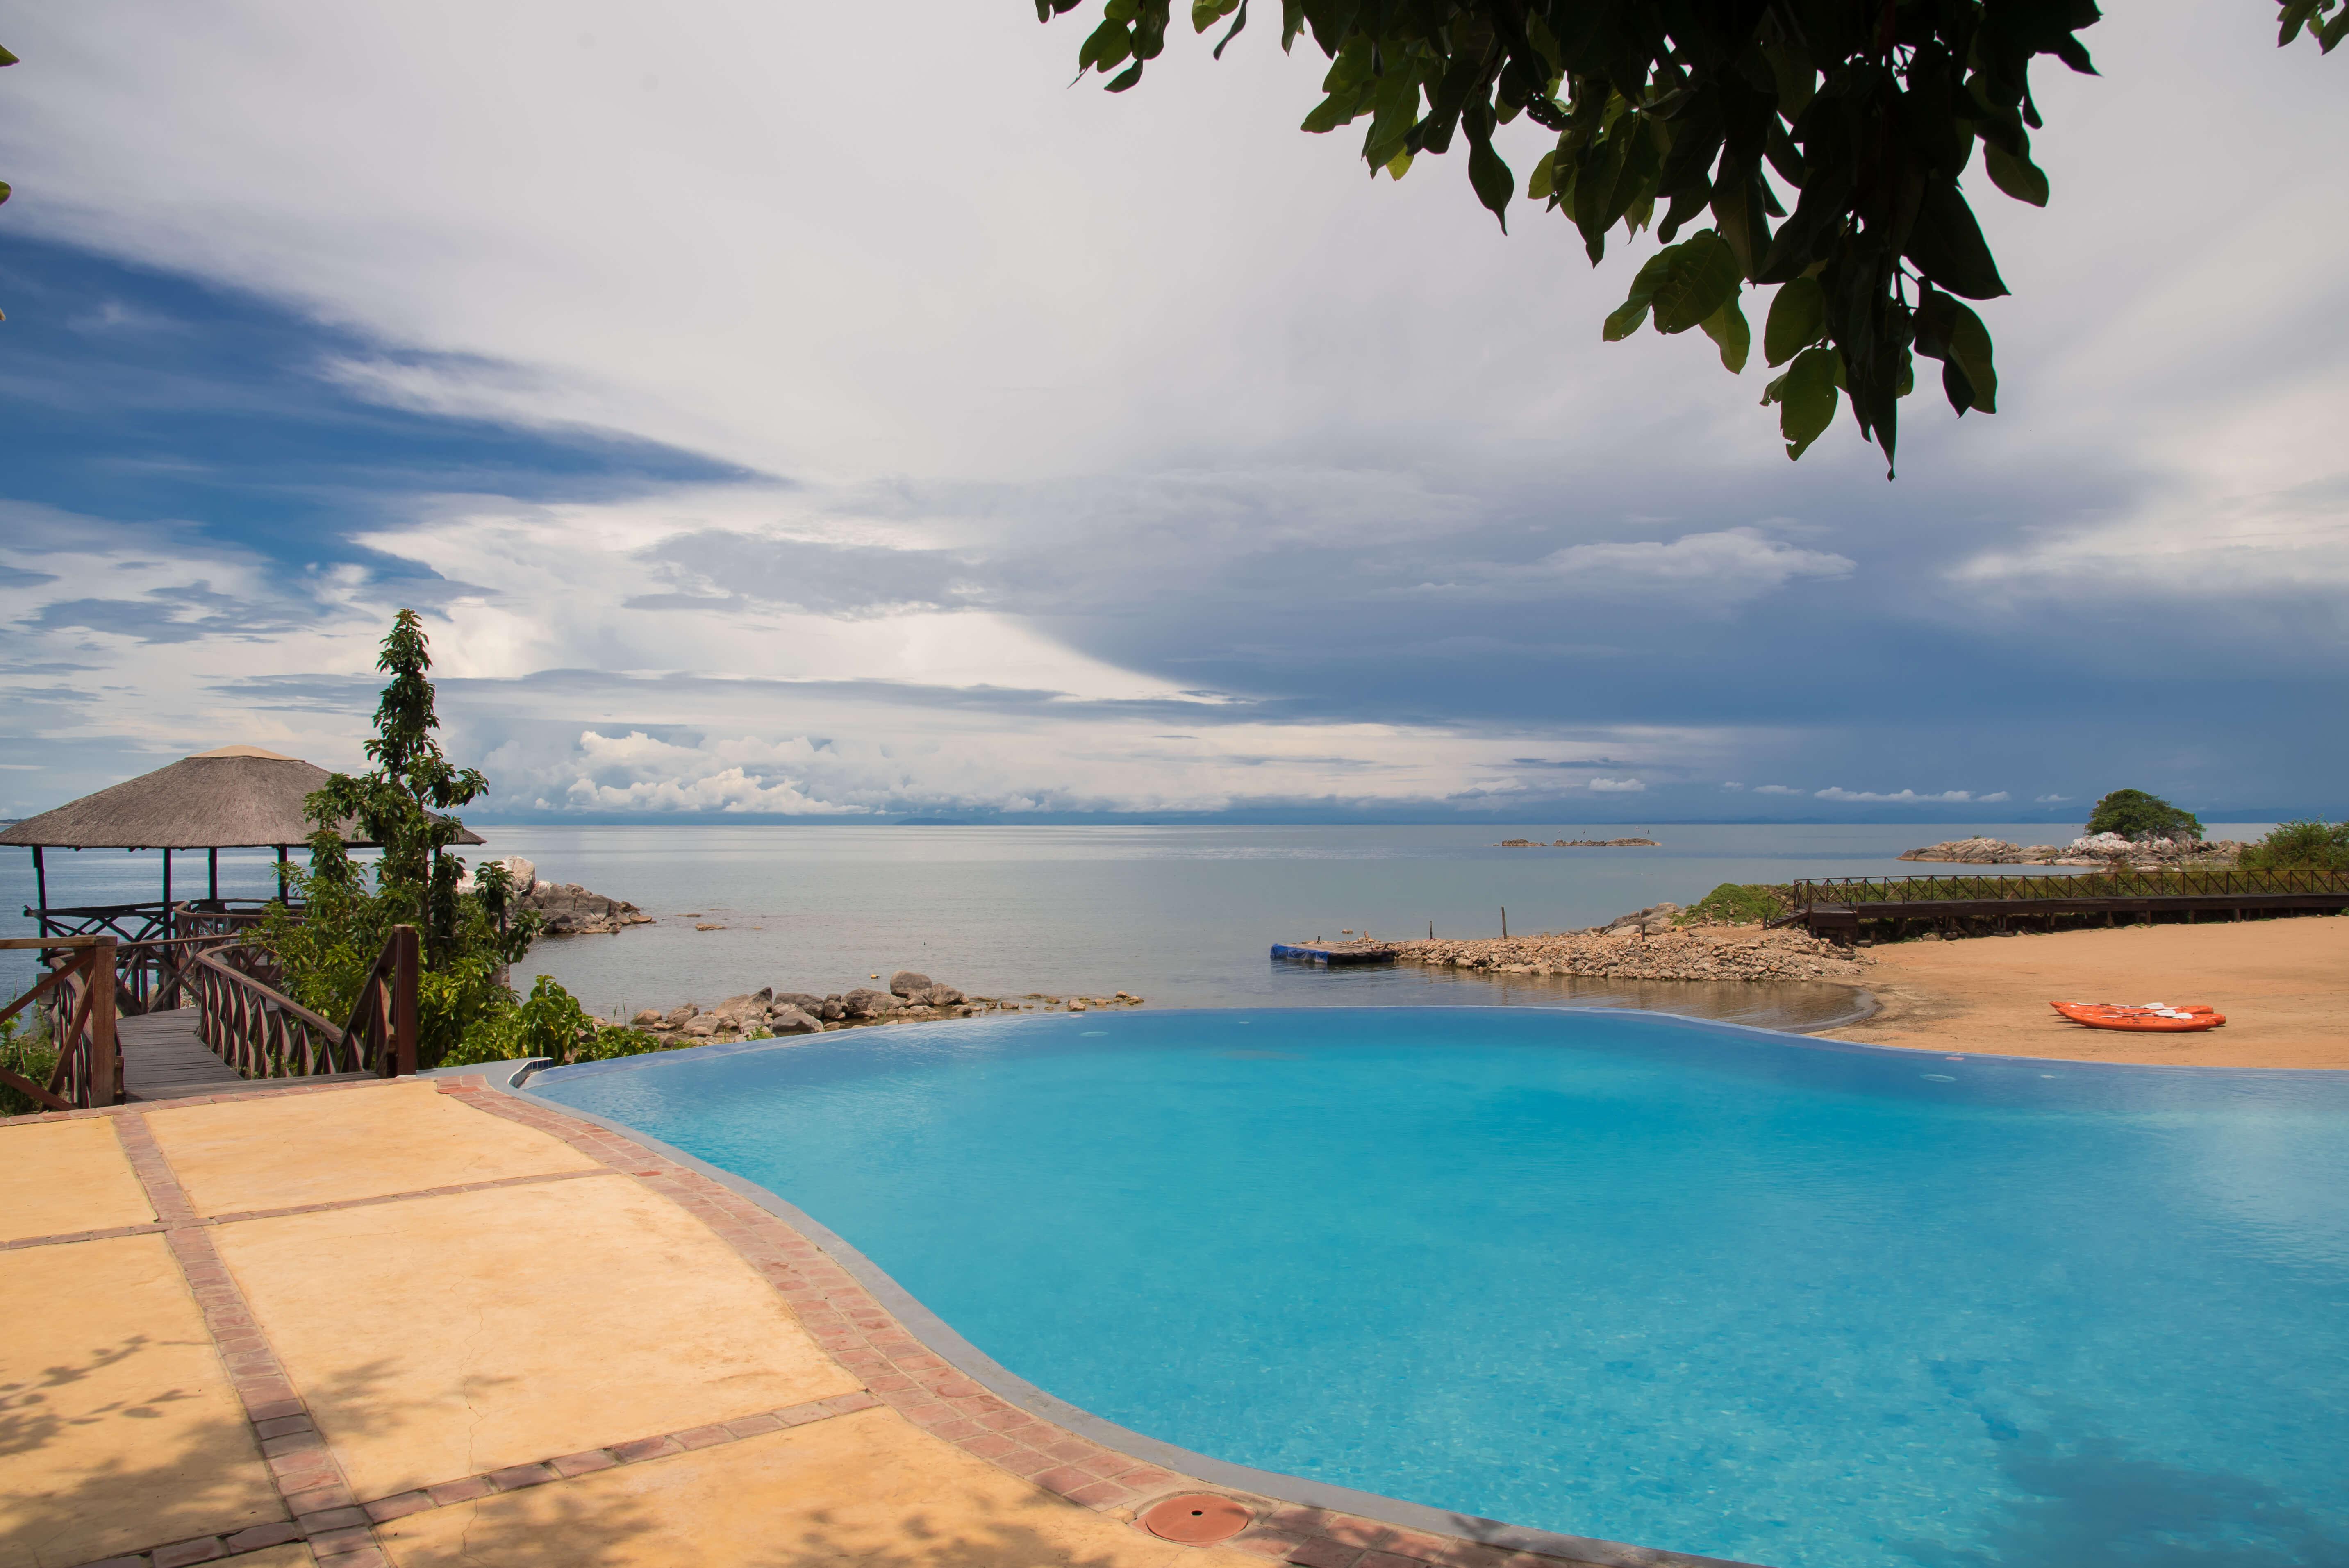 Zwembad Blue Zebra Island Lodge Malawi